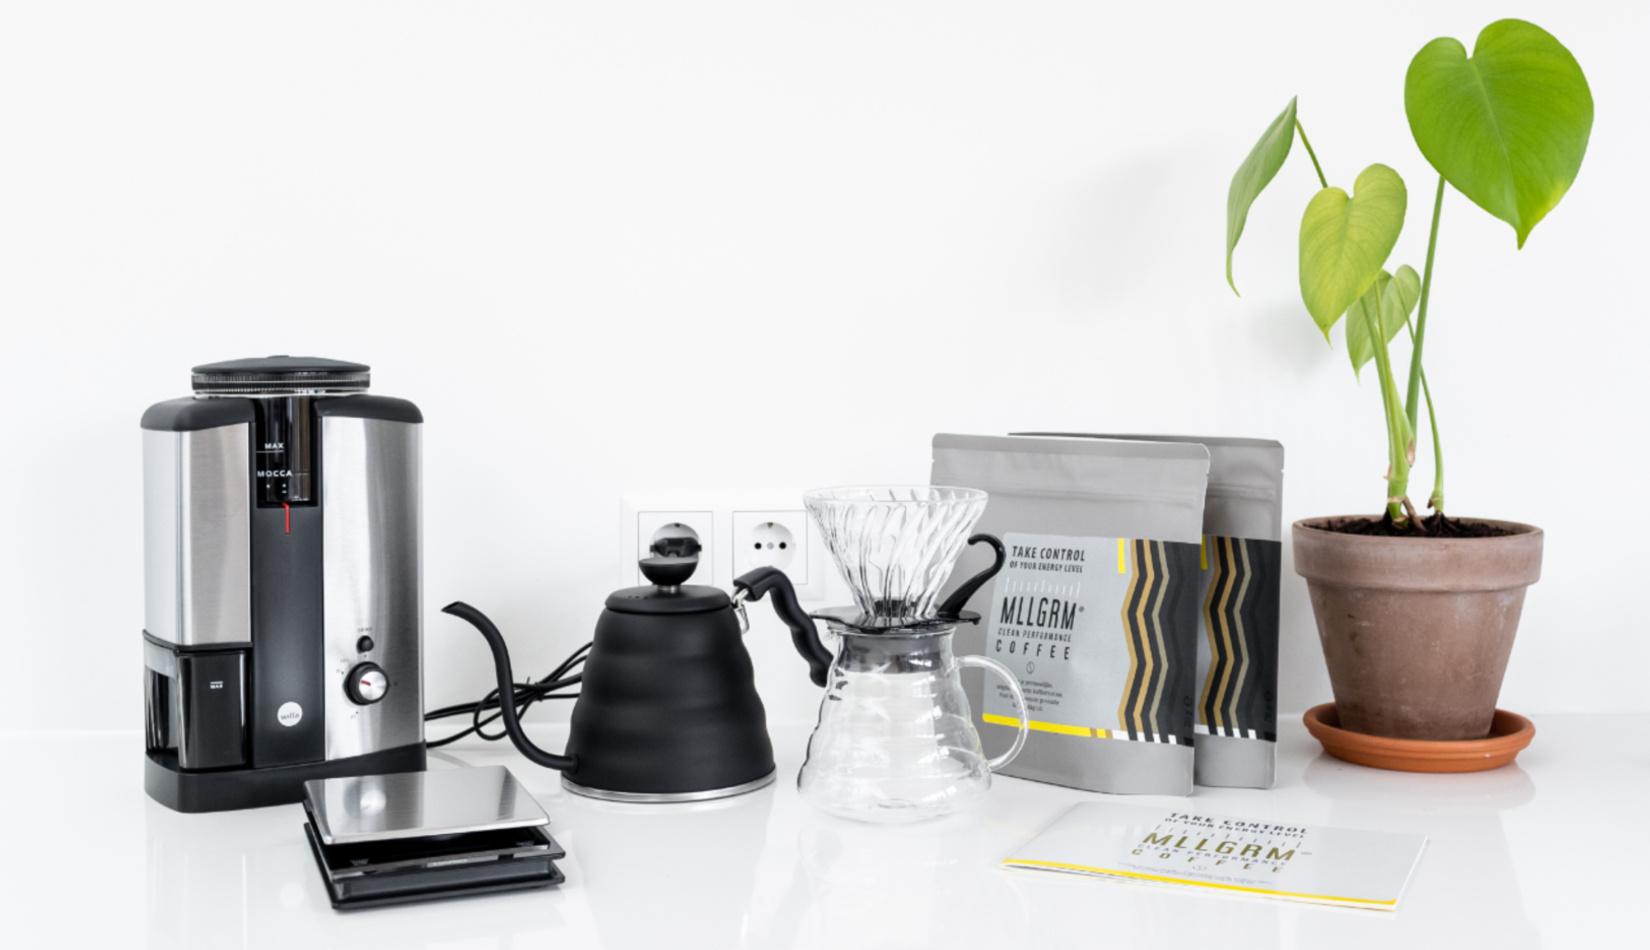 Alles-in-één Filterkoffie Homekit Glas-1